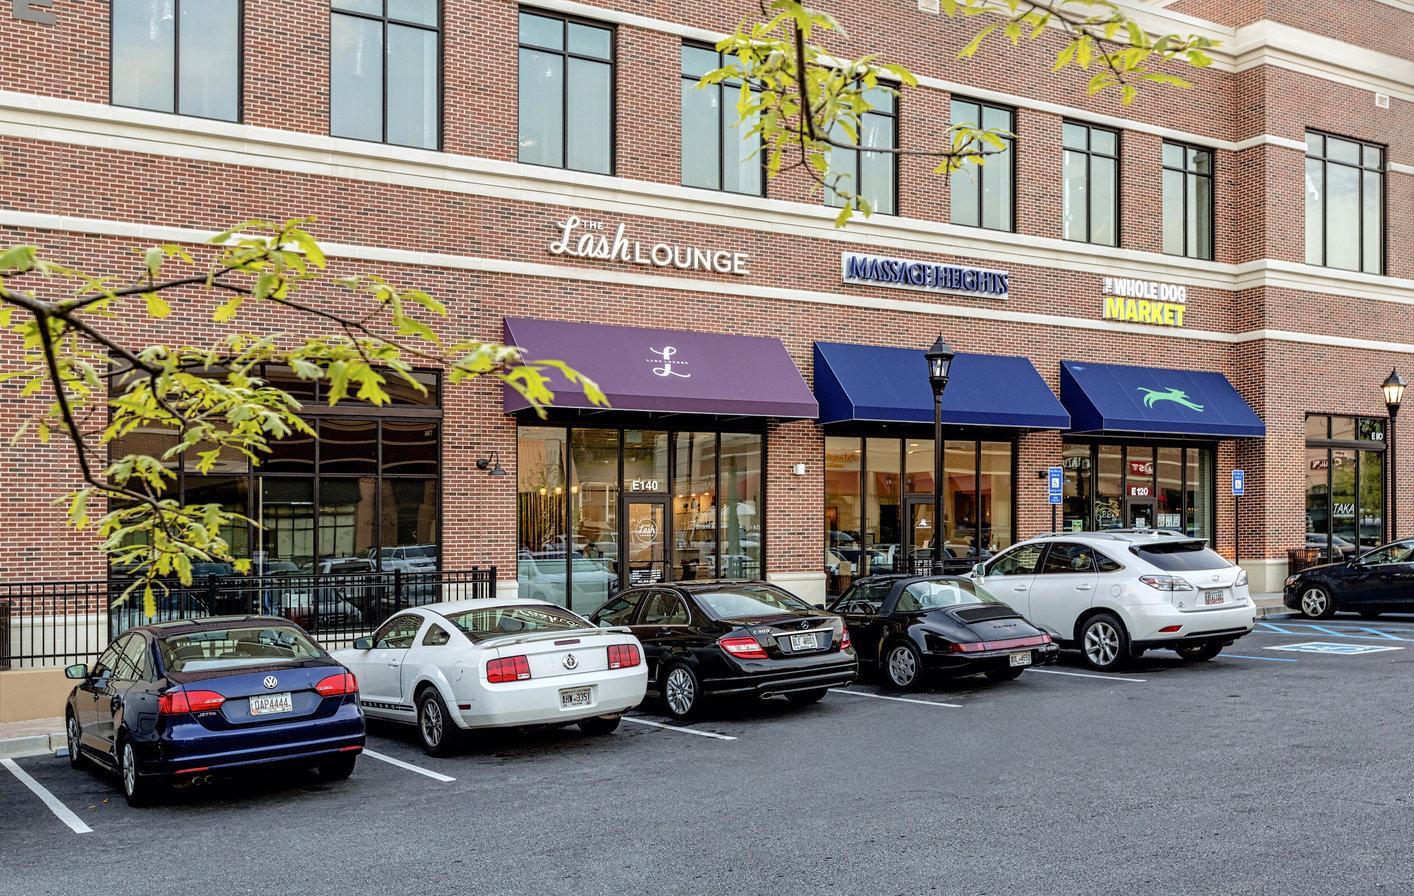 The Lash Lounge - Chastain Park Civic Association